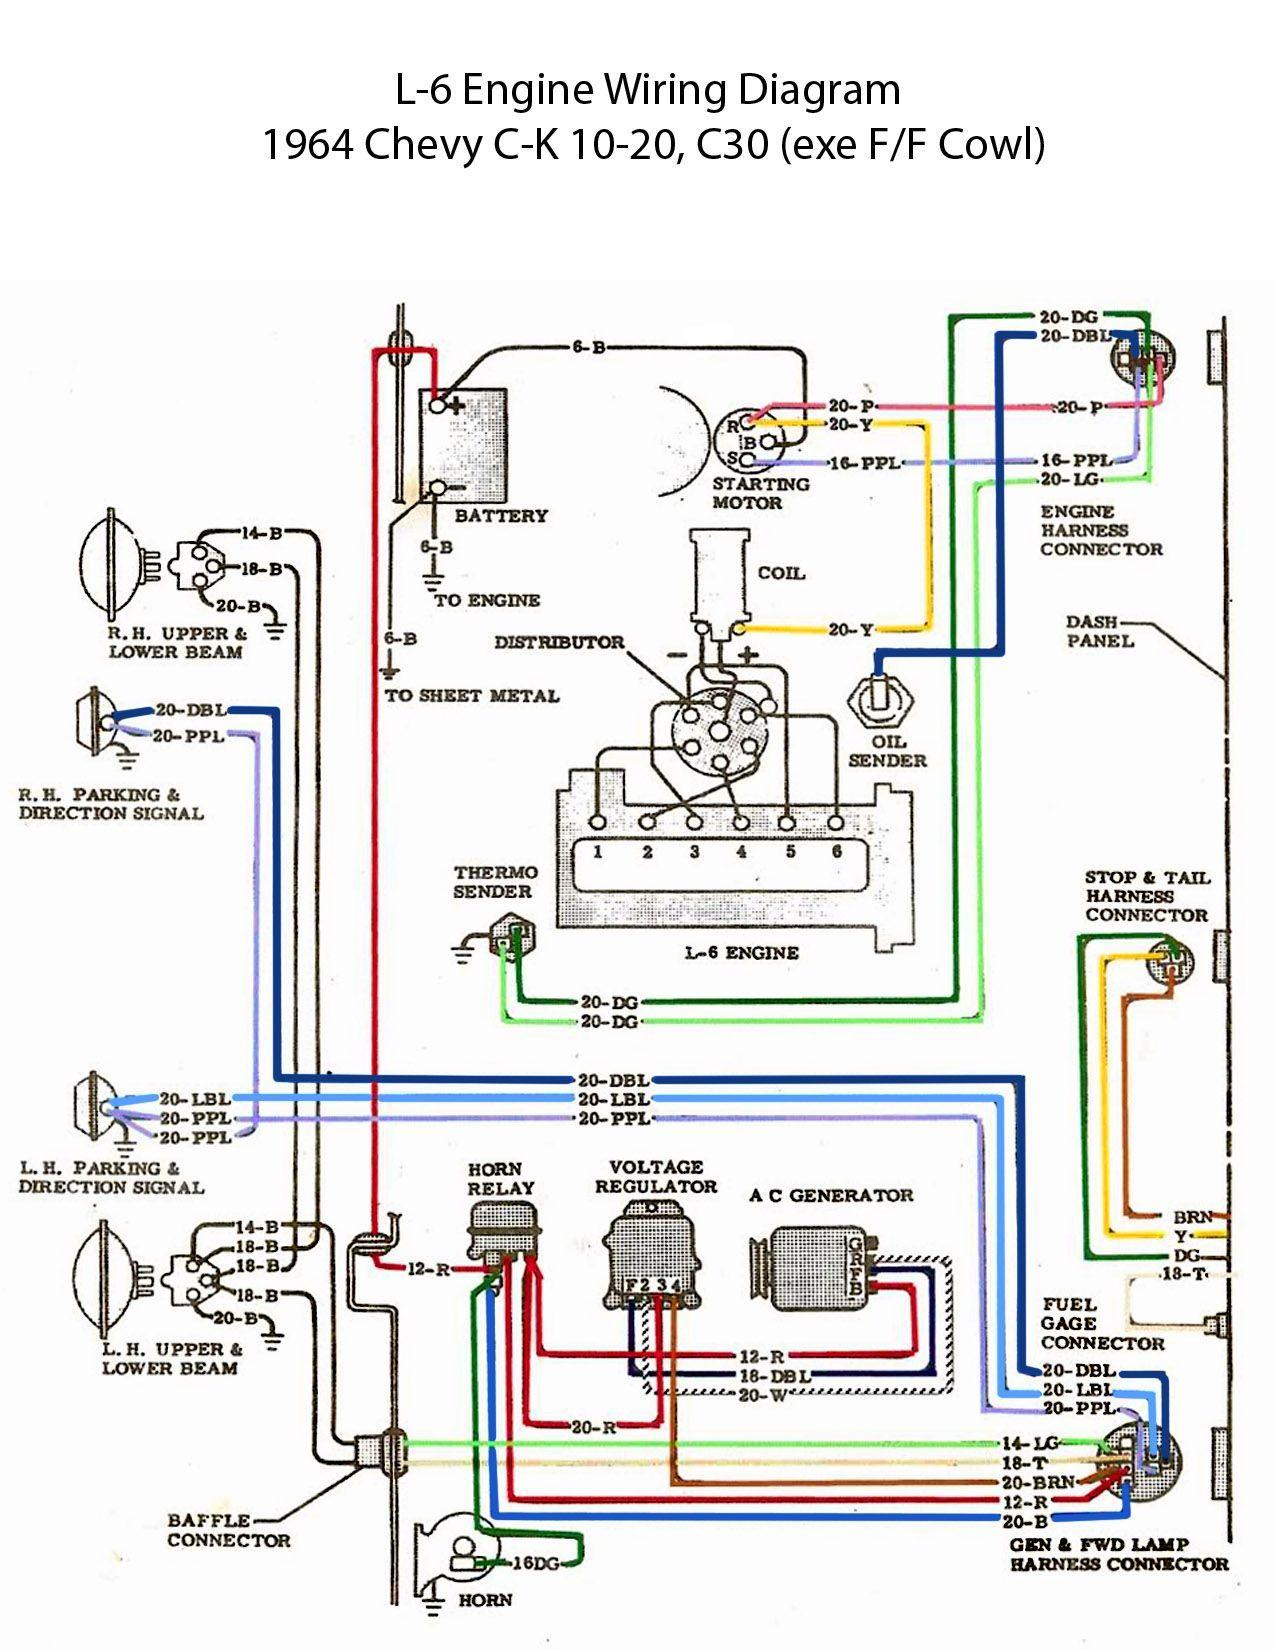 1973 Vw Super Beetle Engine Wiring Diagram Schematic And Wiring Diagram Chevy Trucks 1963 Chevy Truck Electrical Diagram